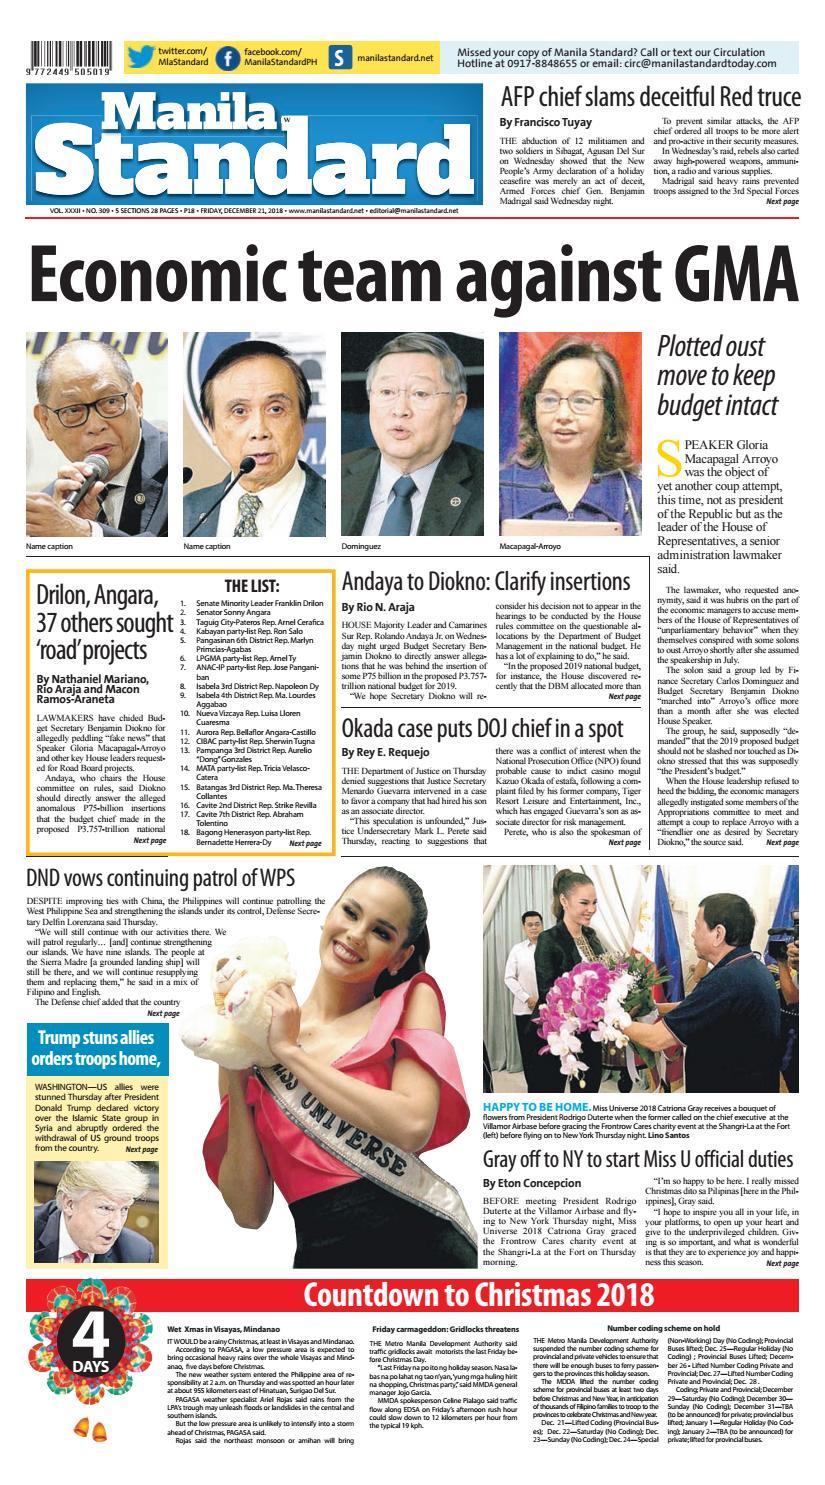 Manila Standard - 2018 December 21 - Friday by Manila Standard - issuu